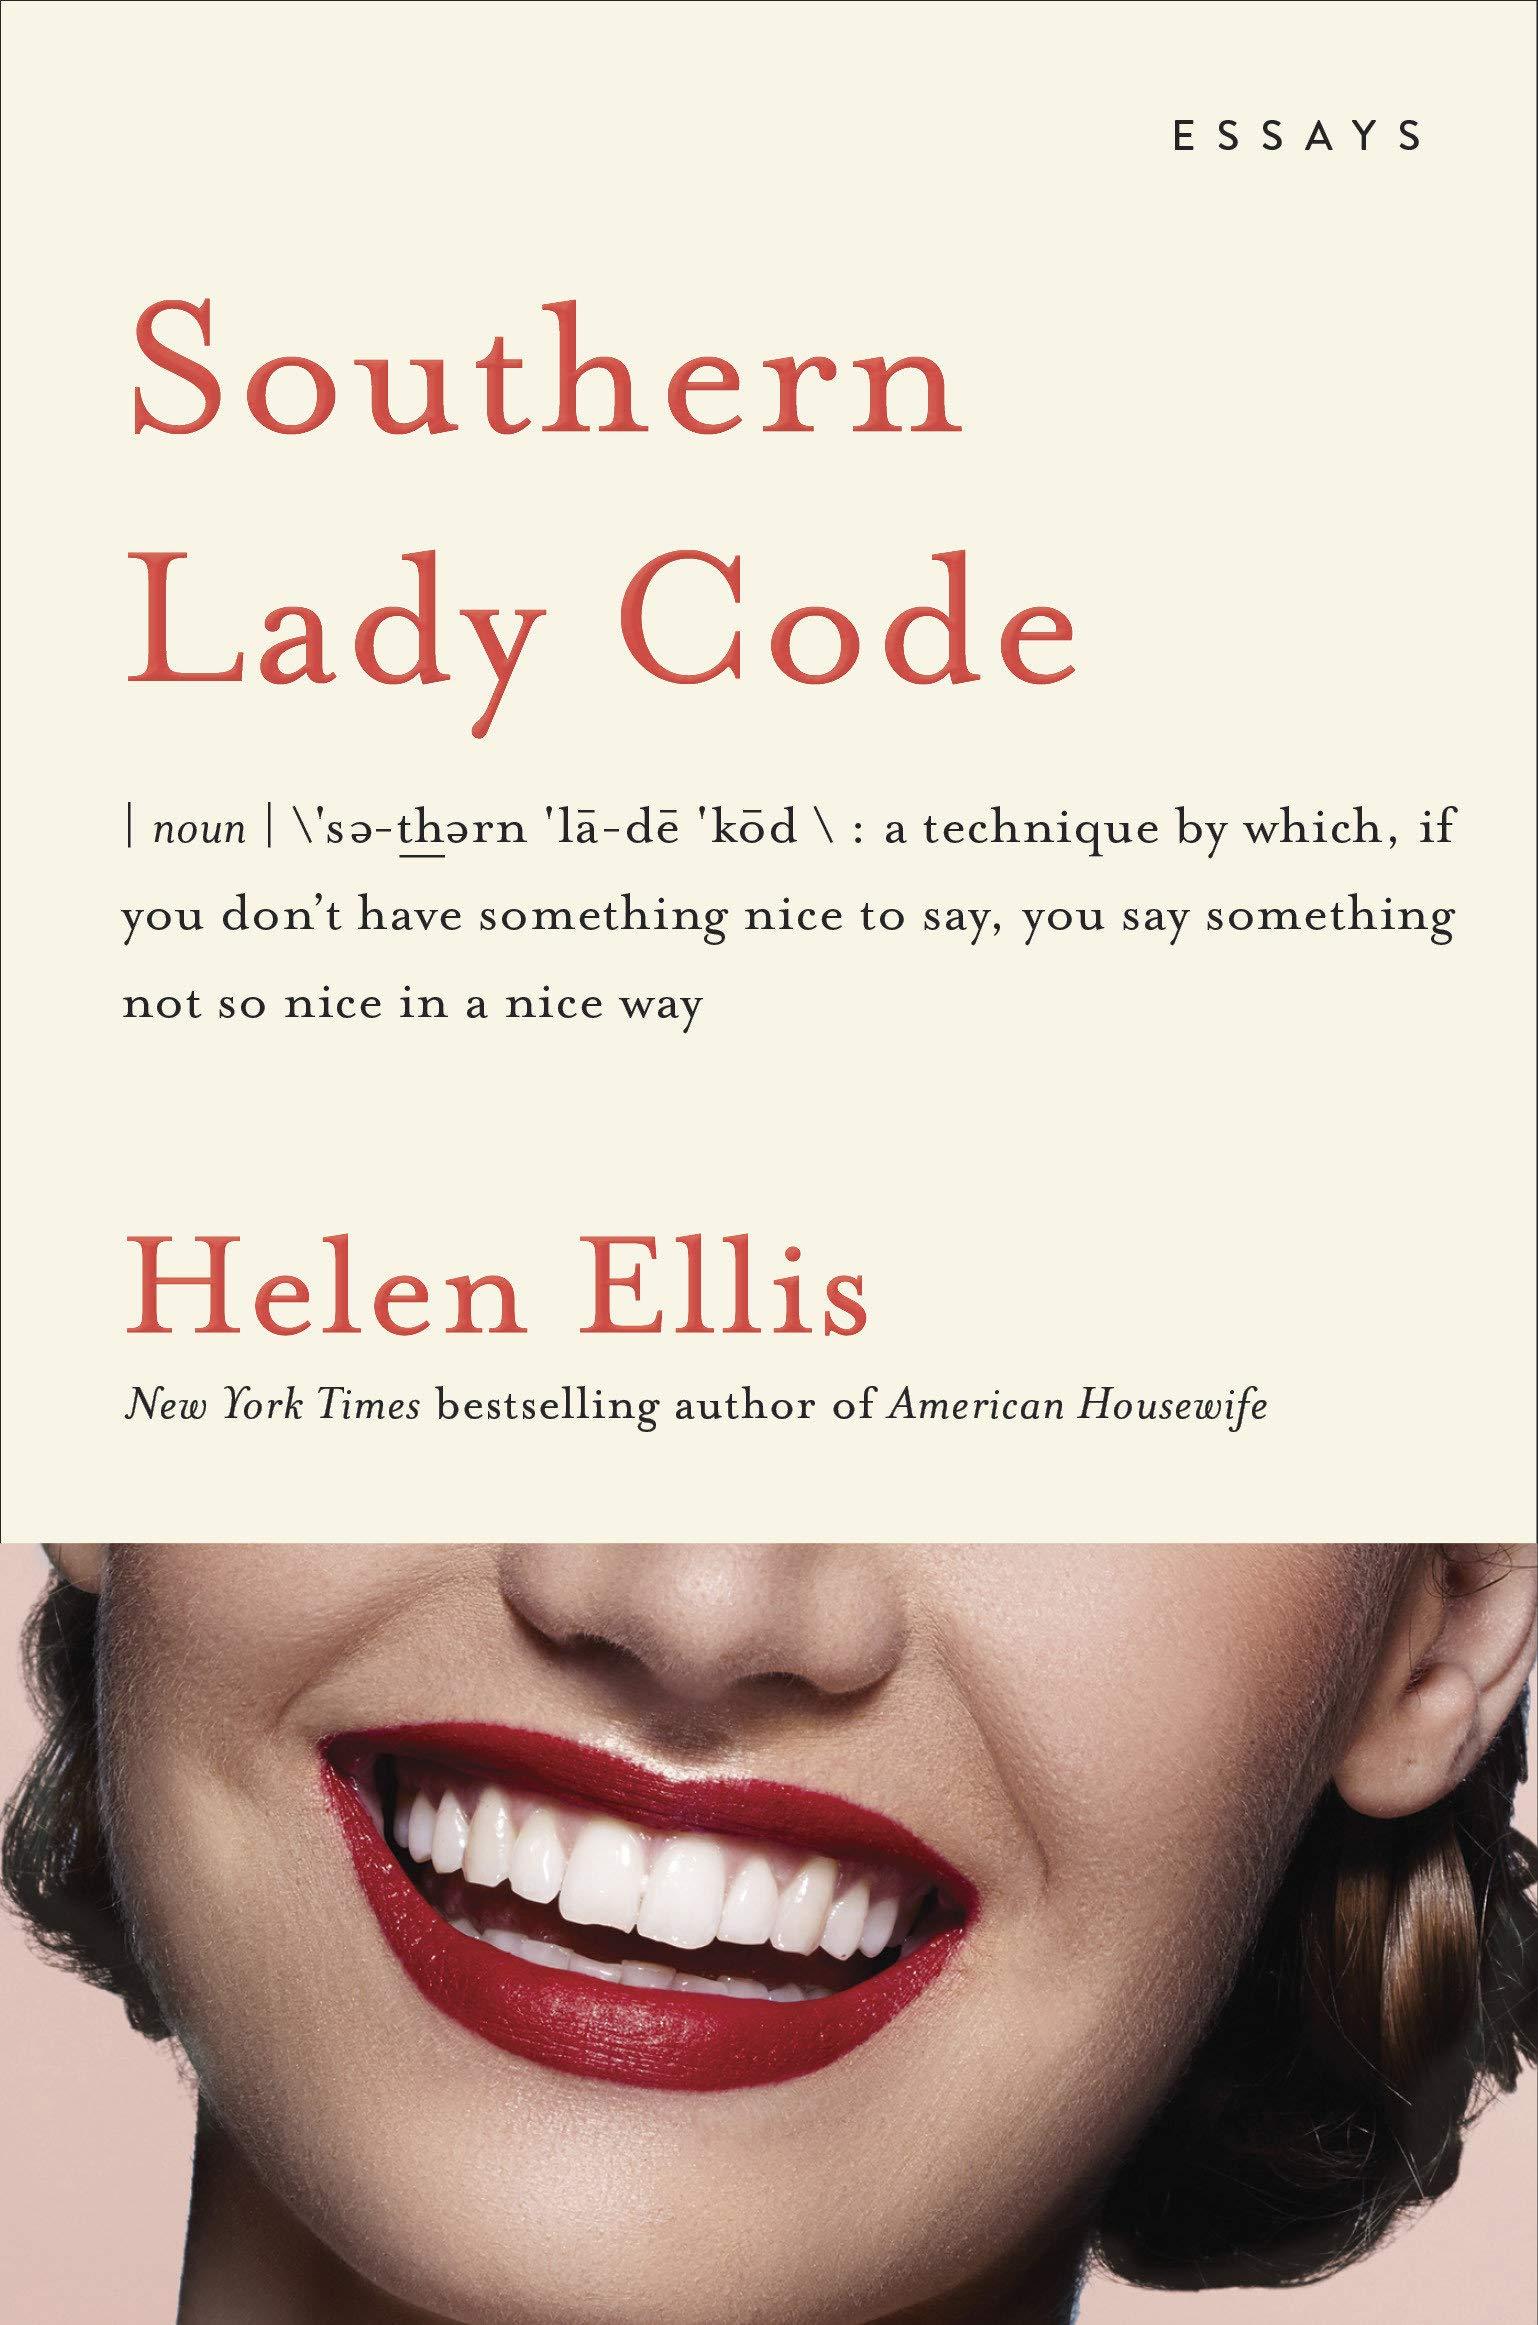 Southern Lady Code: Essays: Helen Ellis: 9780385543897